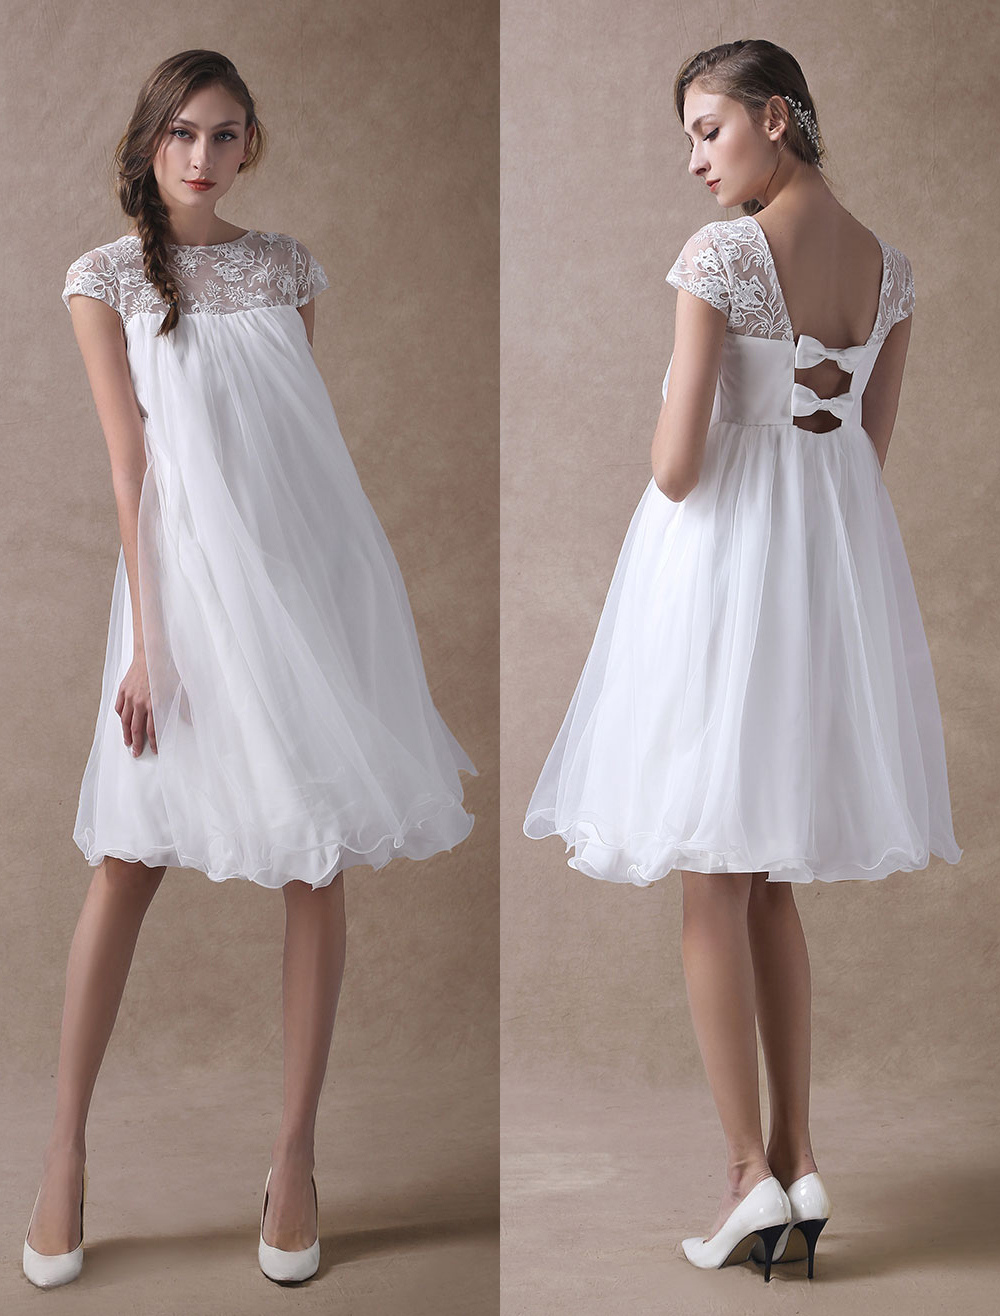 Casual Wedding Dresses Short Empire Waist Lace Tulle Cap Sleeve Pregnant Bridal Dress